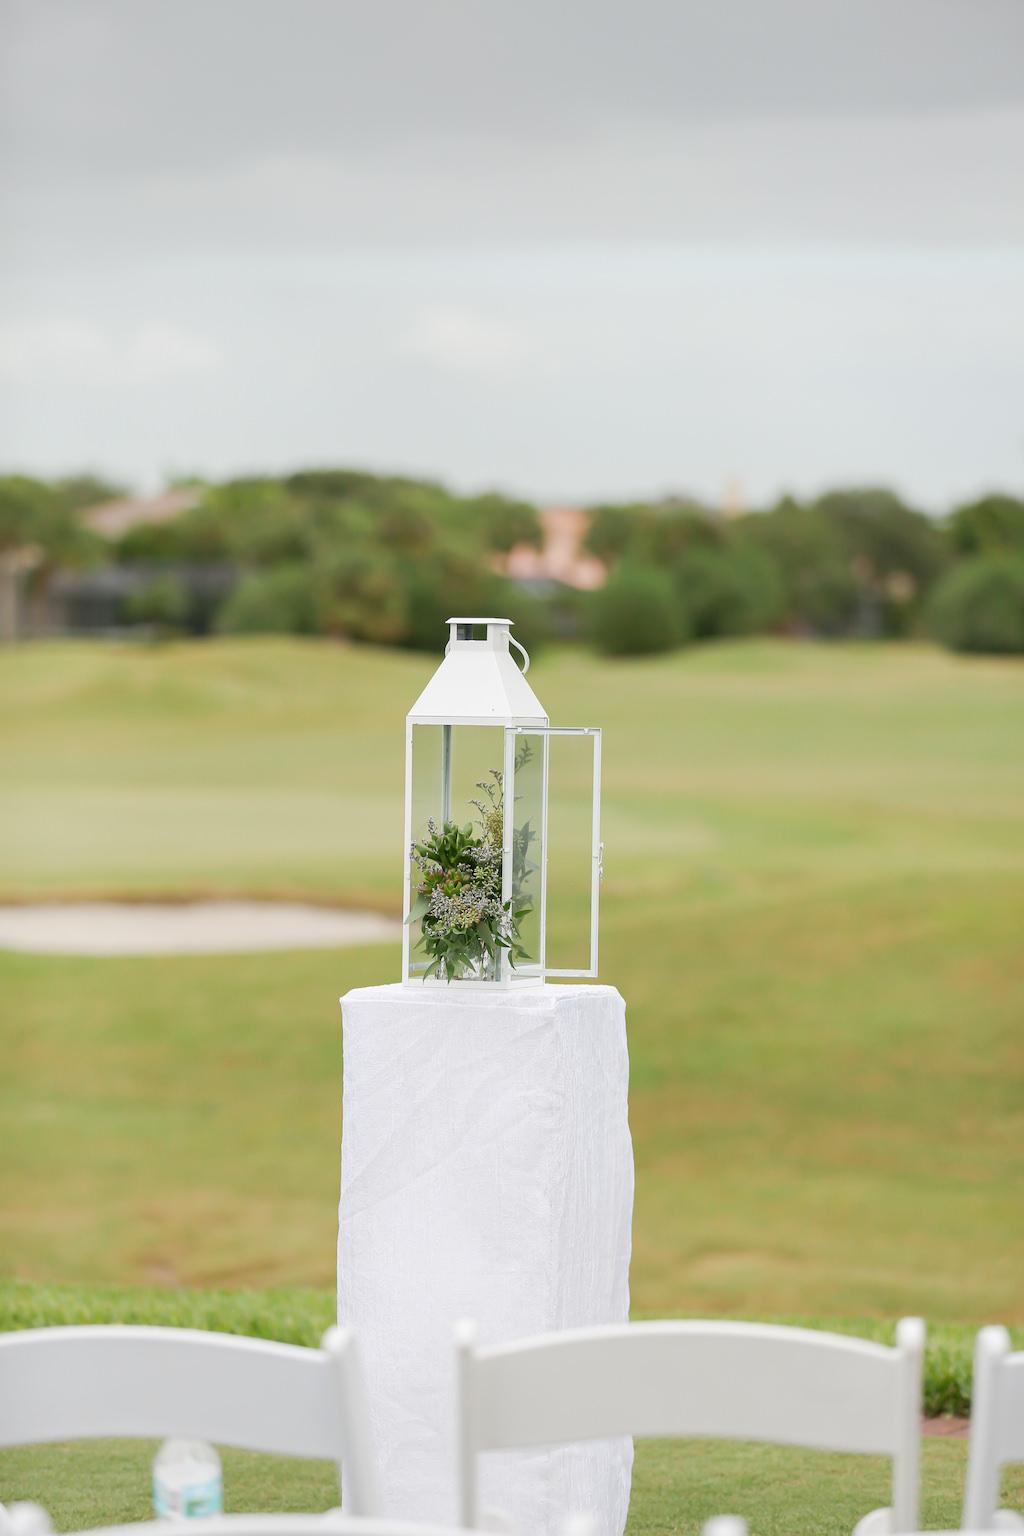 Outdoor Wedding Ceremony Lantern Decor with Greenery | Tampa Bay Golf Course Wedding Venue The Bayou Club | Tampa Wedding Photographer Lifelong Photography Studio